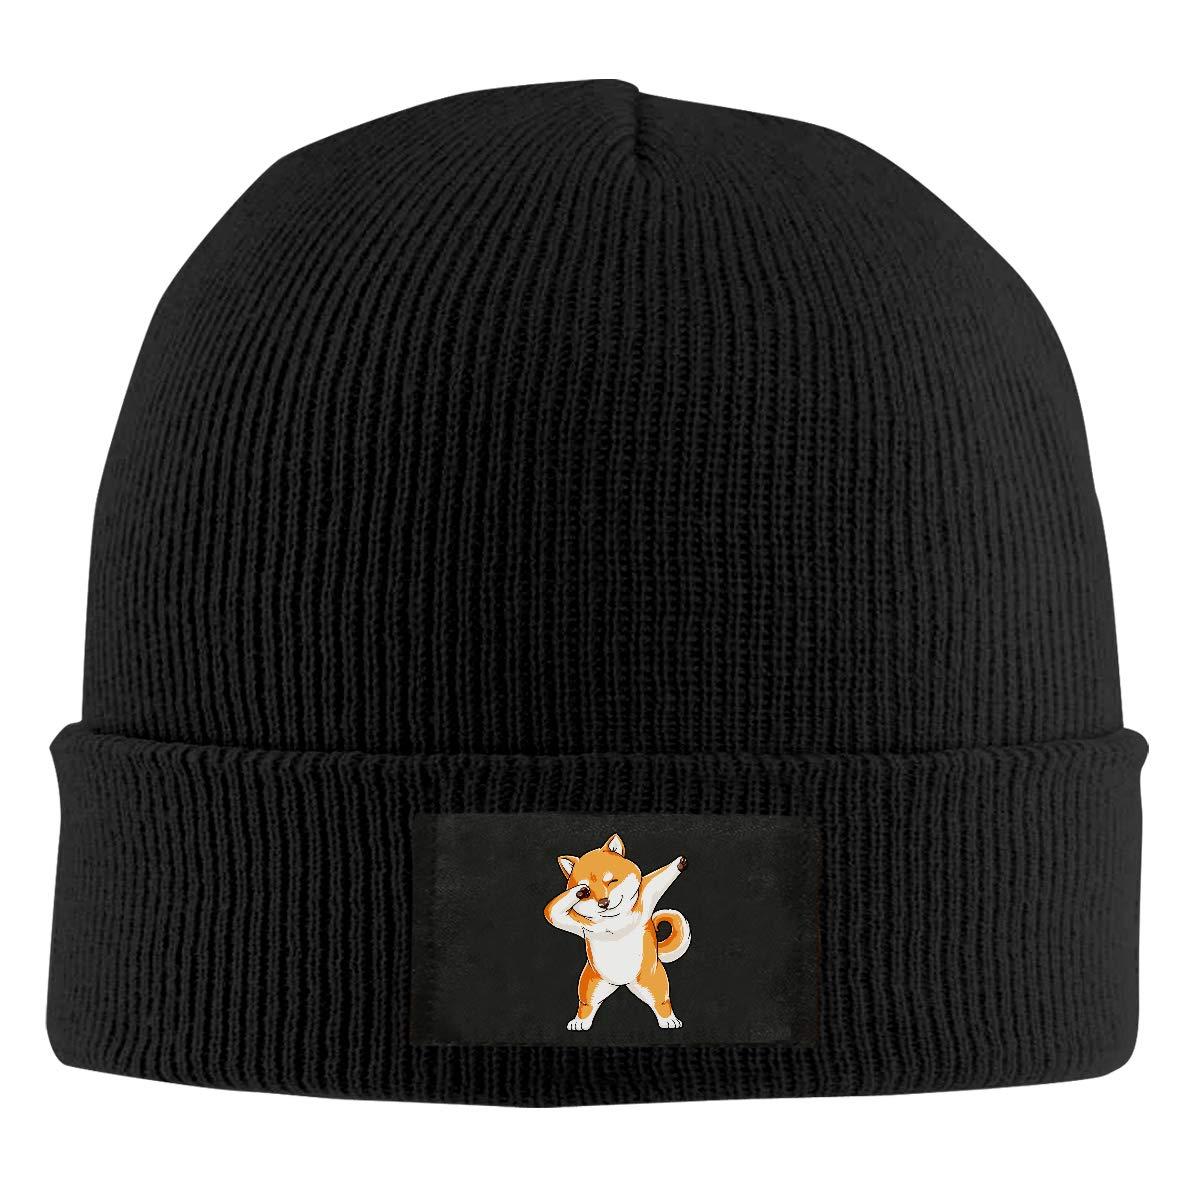 BF5Y6z/&MA Unisex Dabbing Doge Shiba Inu Knitting Hat 100/% Acrylic Winter Beanies Cap